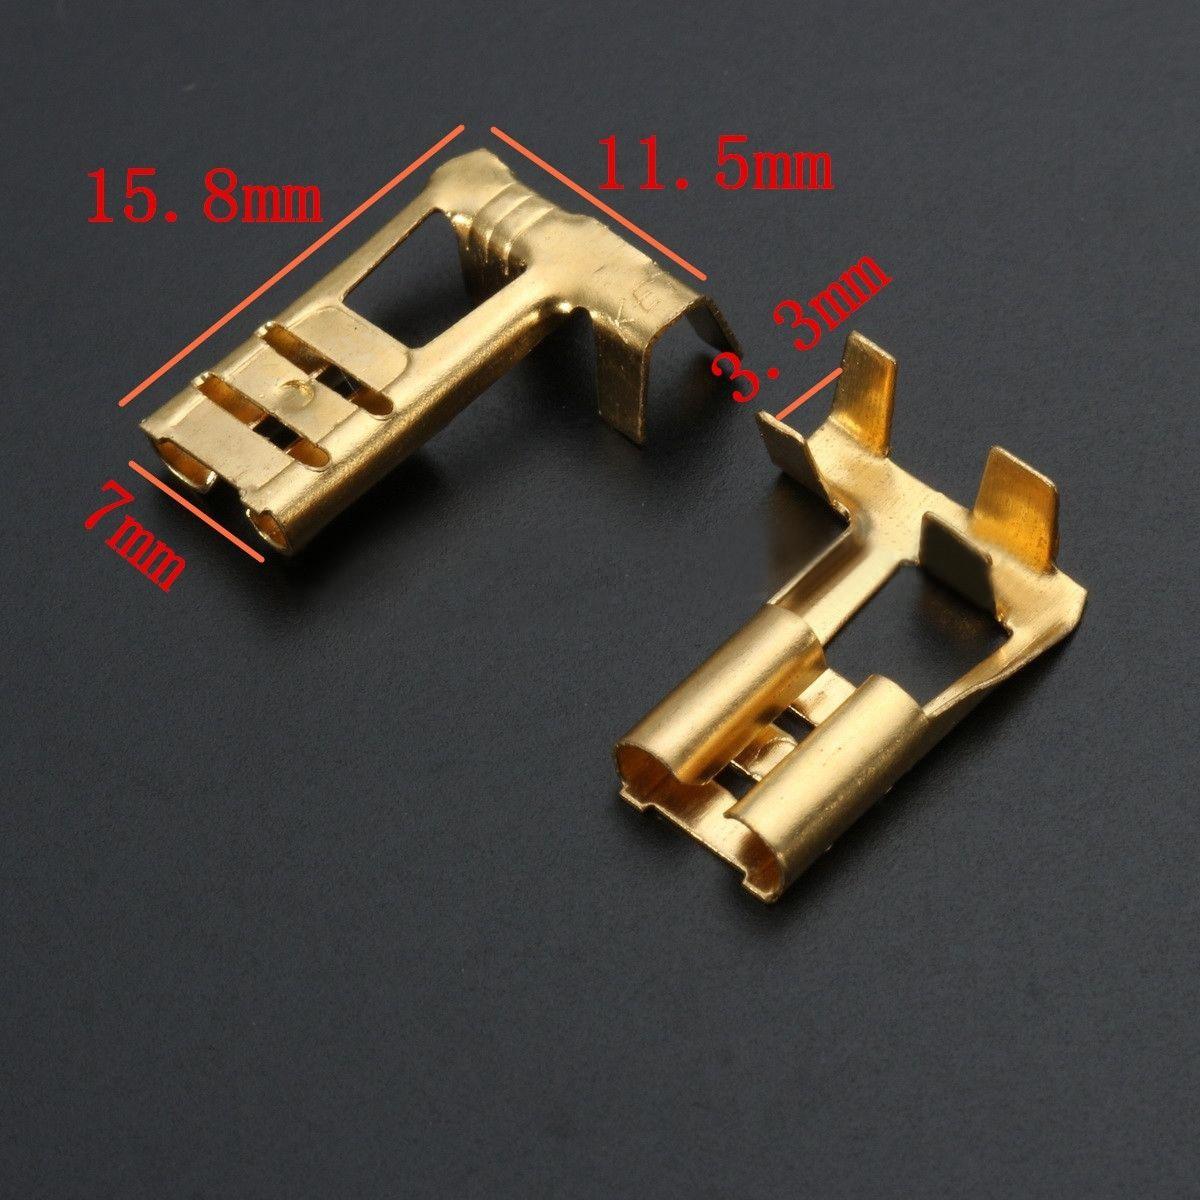 144pcs 2.8mm Motorcycle Brass Bullet Connectors Automotive Harness ...